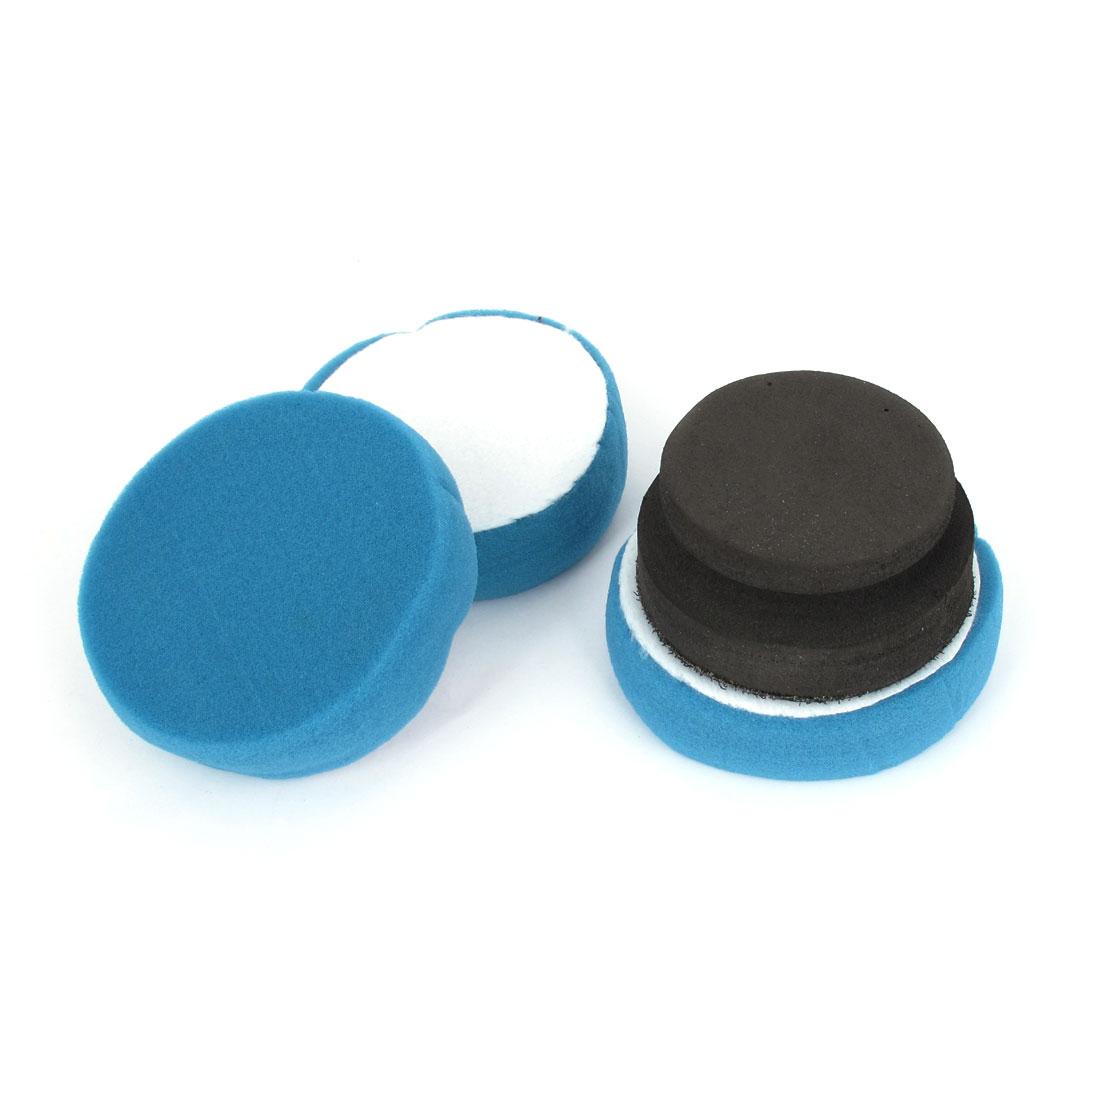 3 in 1 Blue Black Car Round Cleaning Washing Polishing Tool Sponge Pad Set